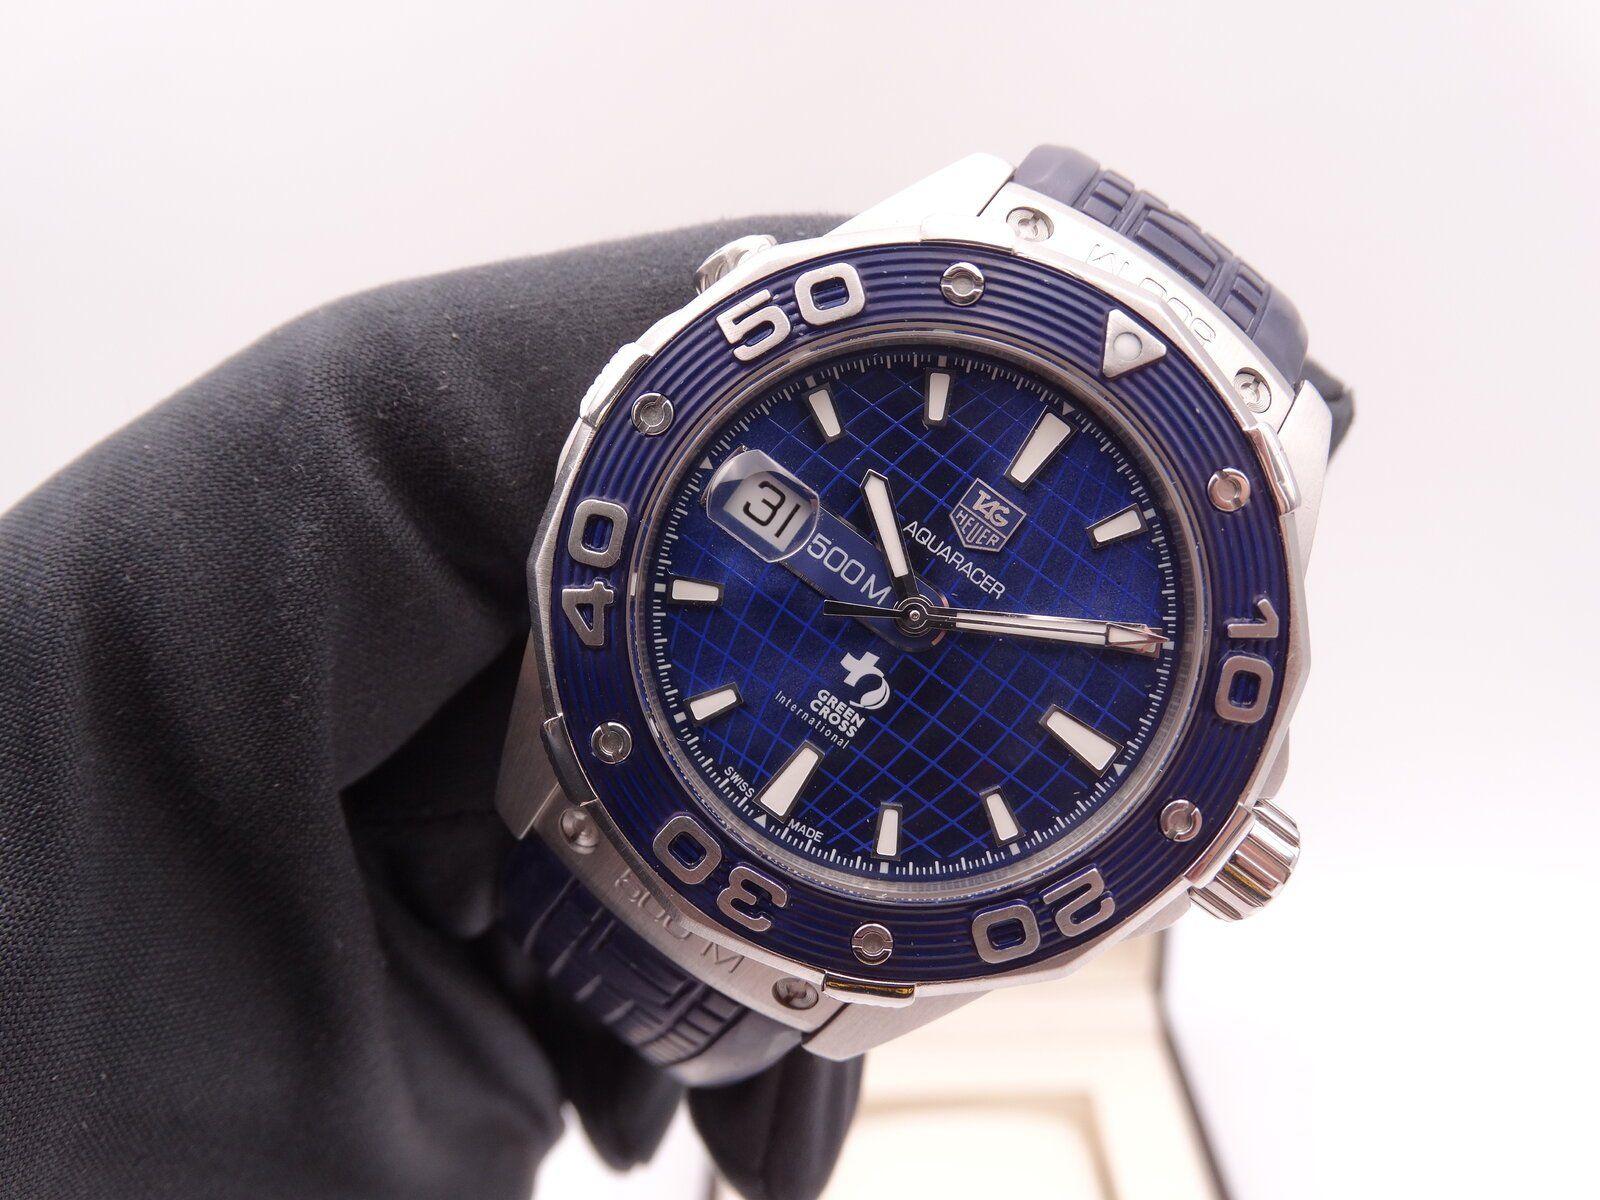 Tag Heuer Aquaracer 500 Dicaprio Green cross Blue Limited 01256.JPG